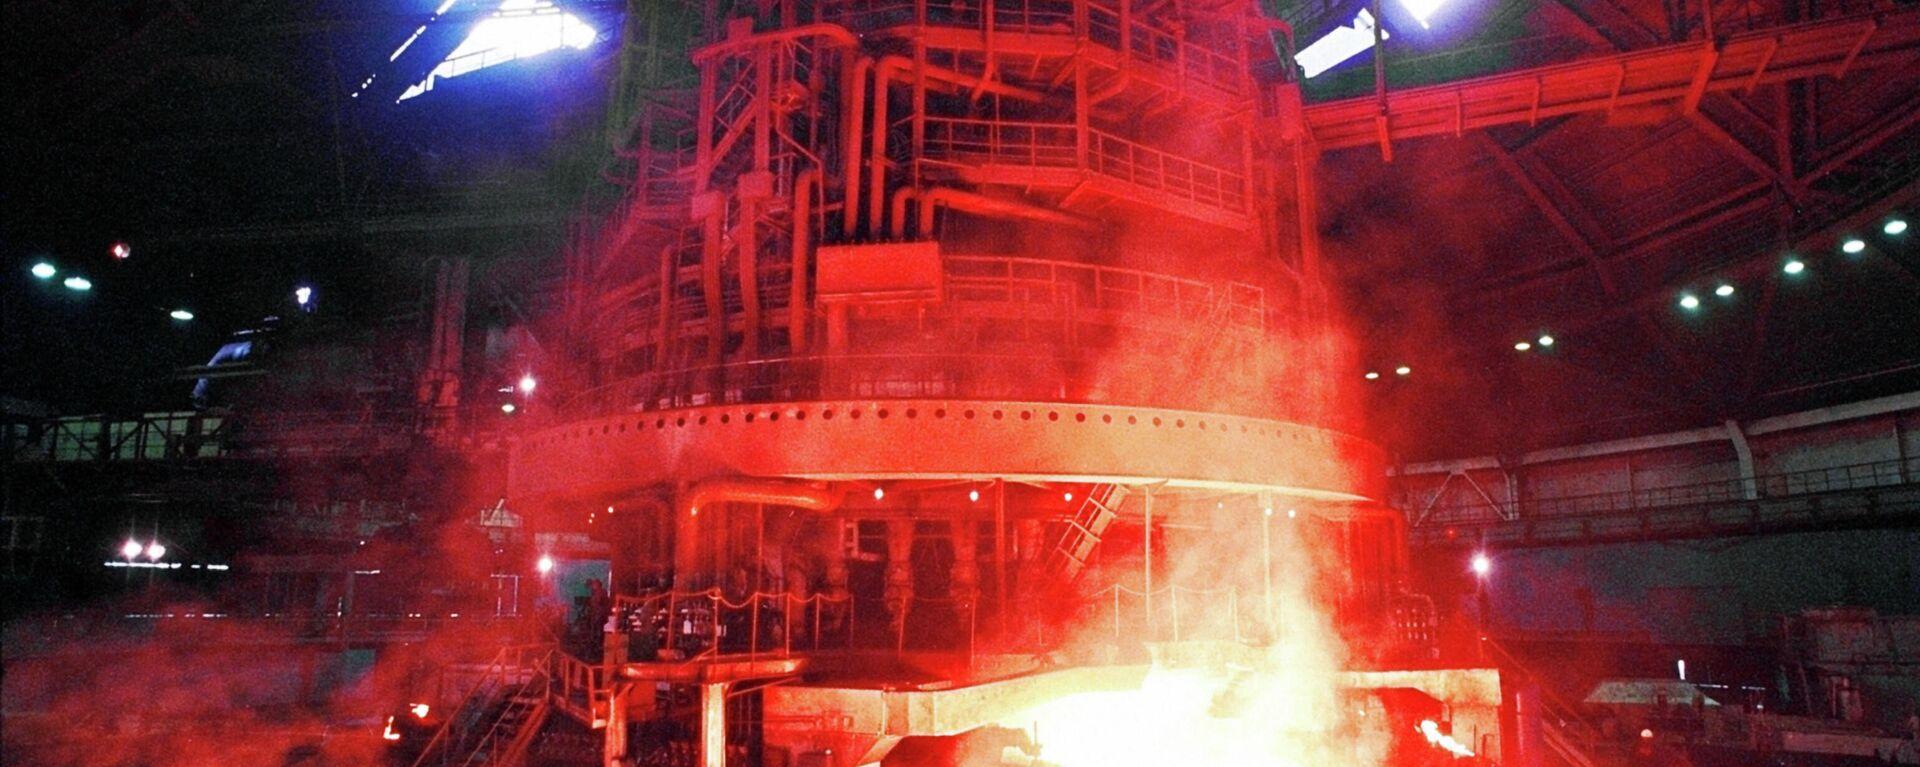 Industria siderurgica - Sputnik Italia, 1920, 08.08.2021